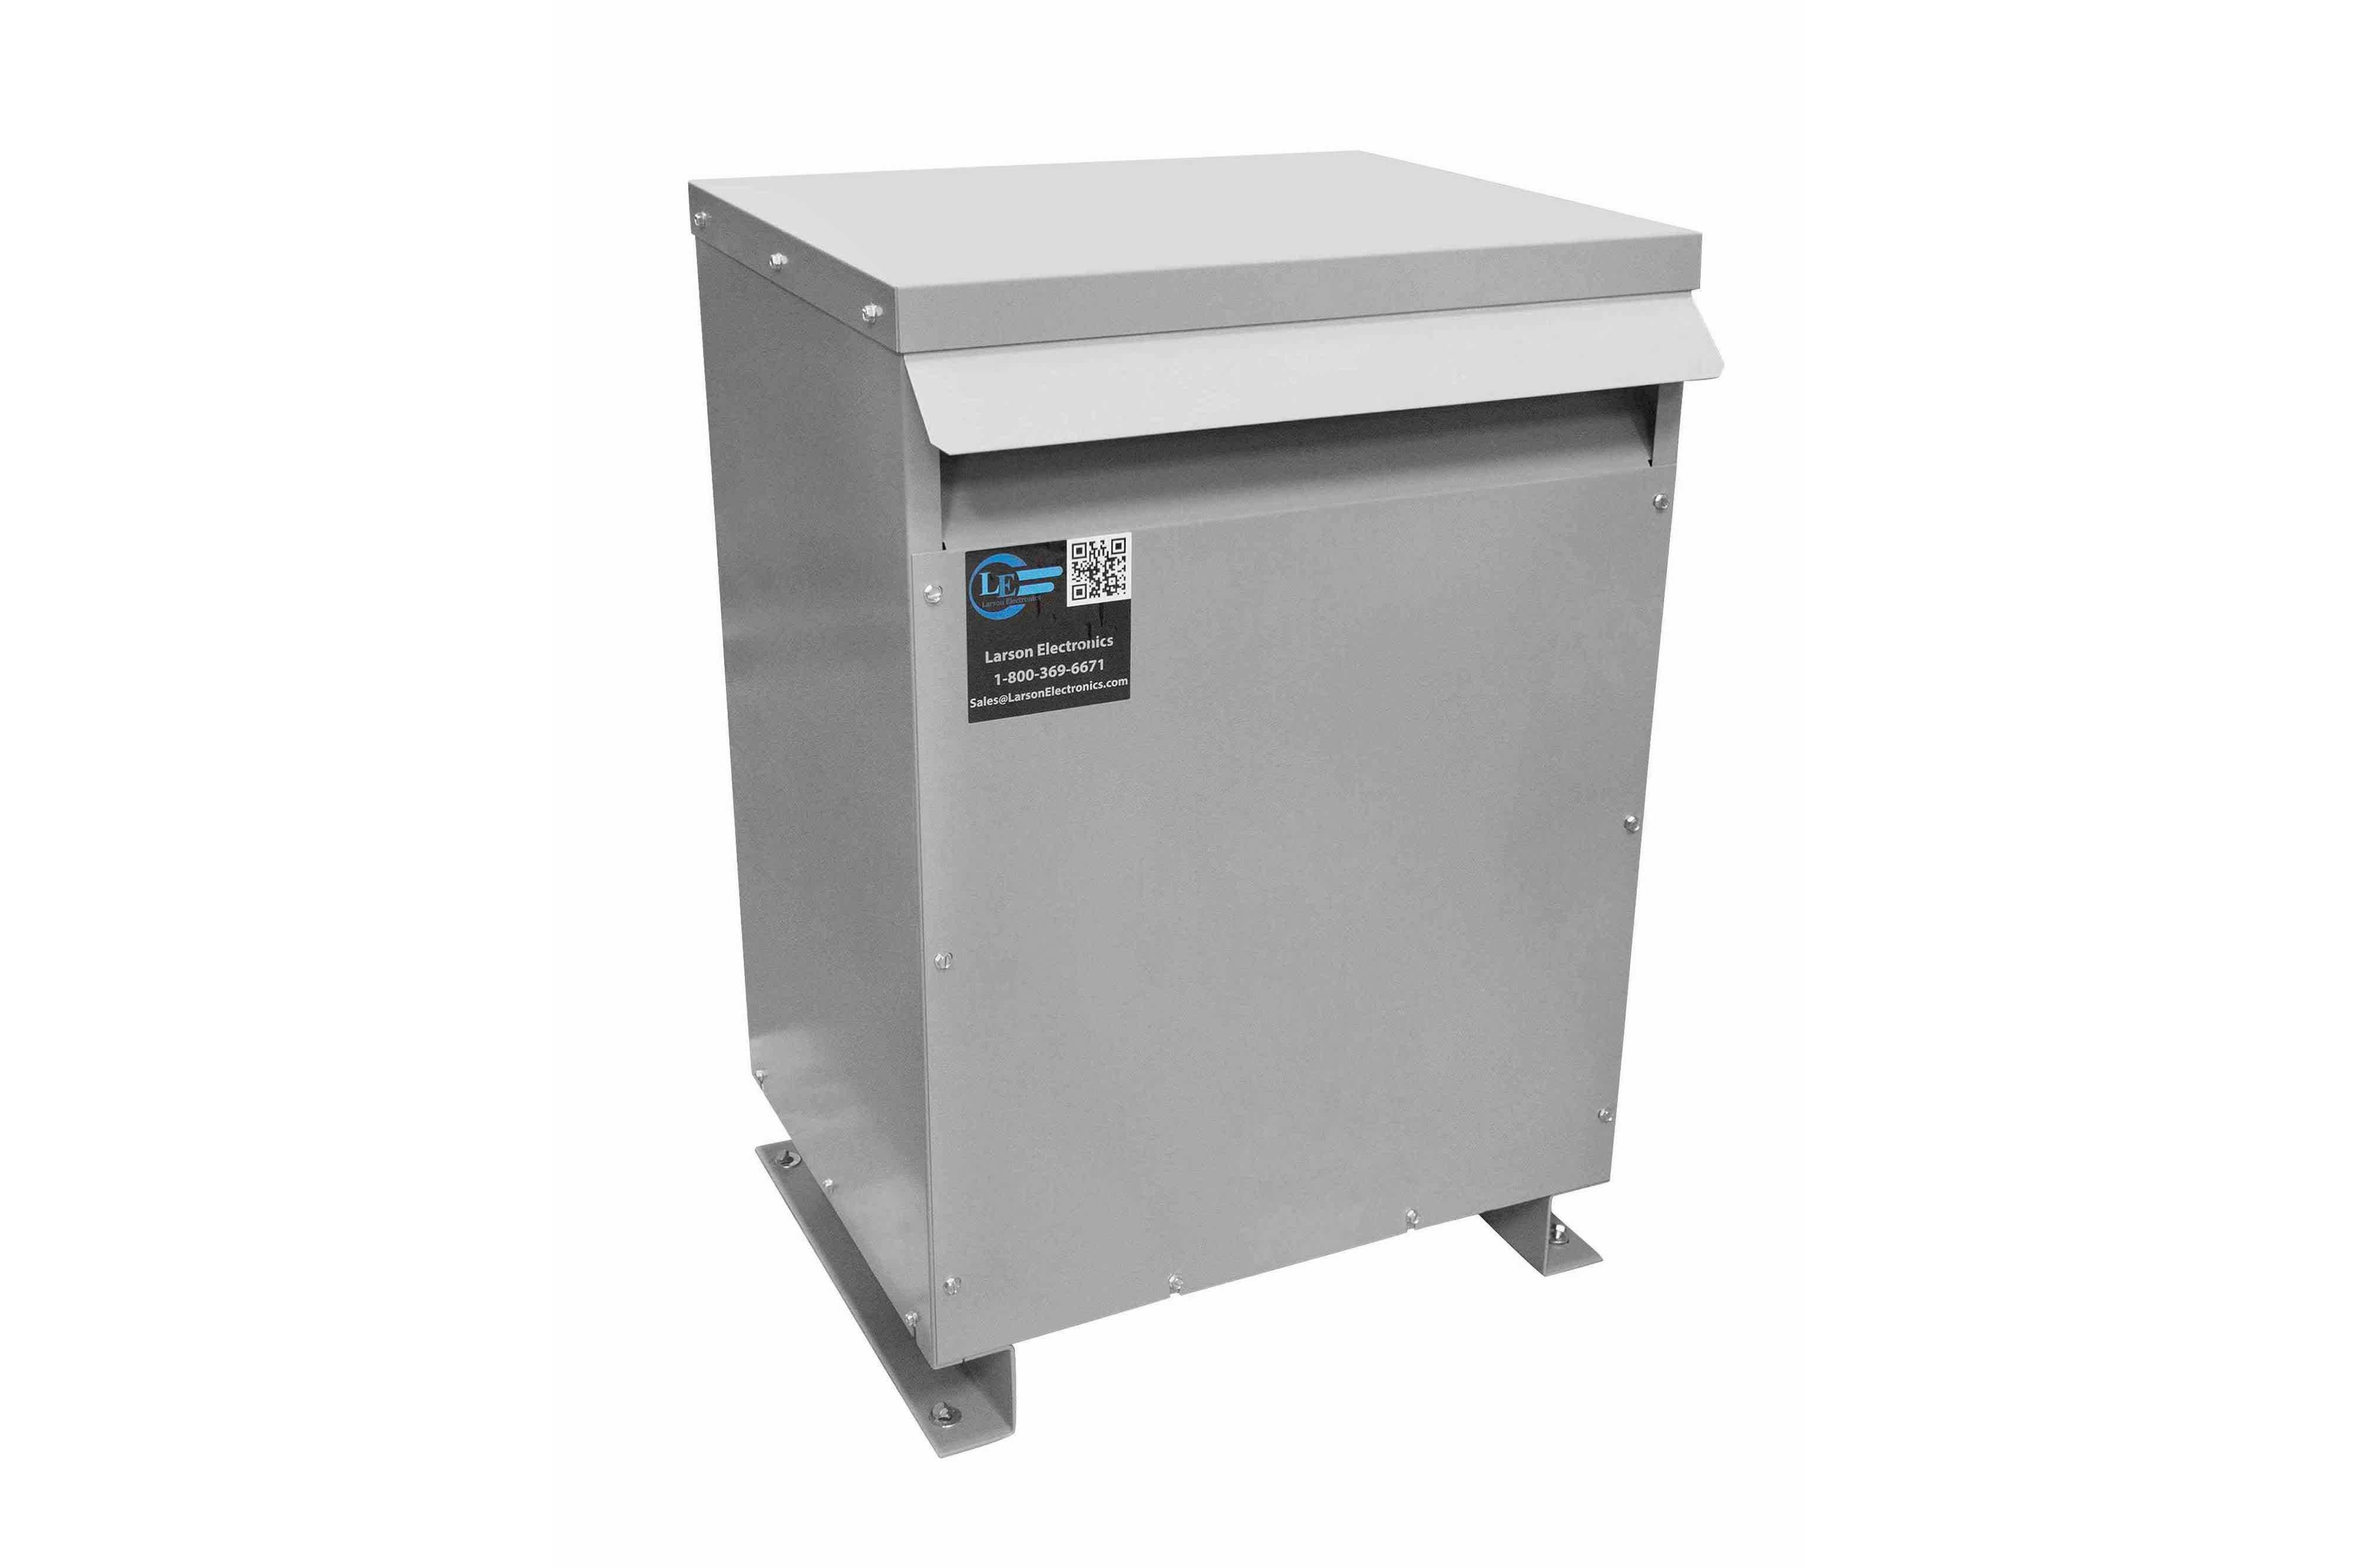 112.5 kVA 3PH Isolation Transformer, 460V Wye Primary, 600V Delta Secondary, N3R, Ventilated, 60 Hz